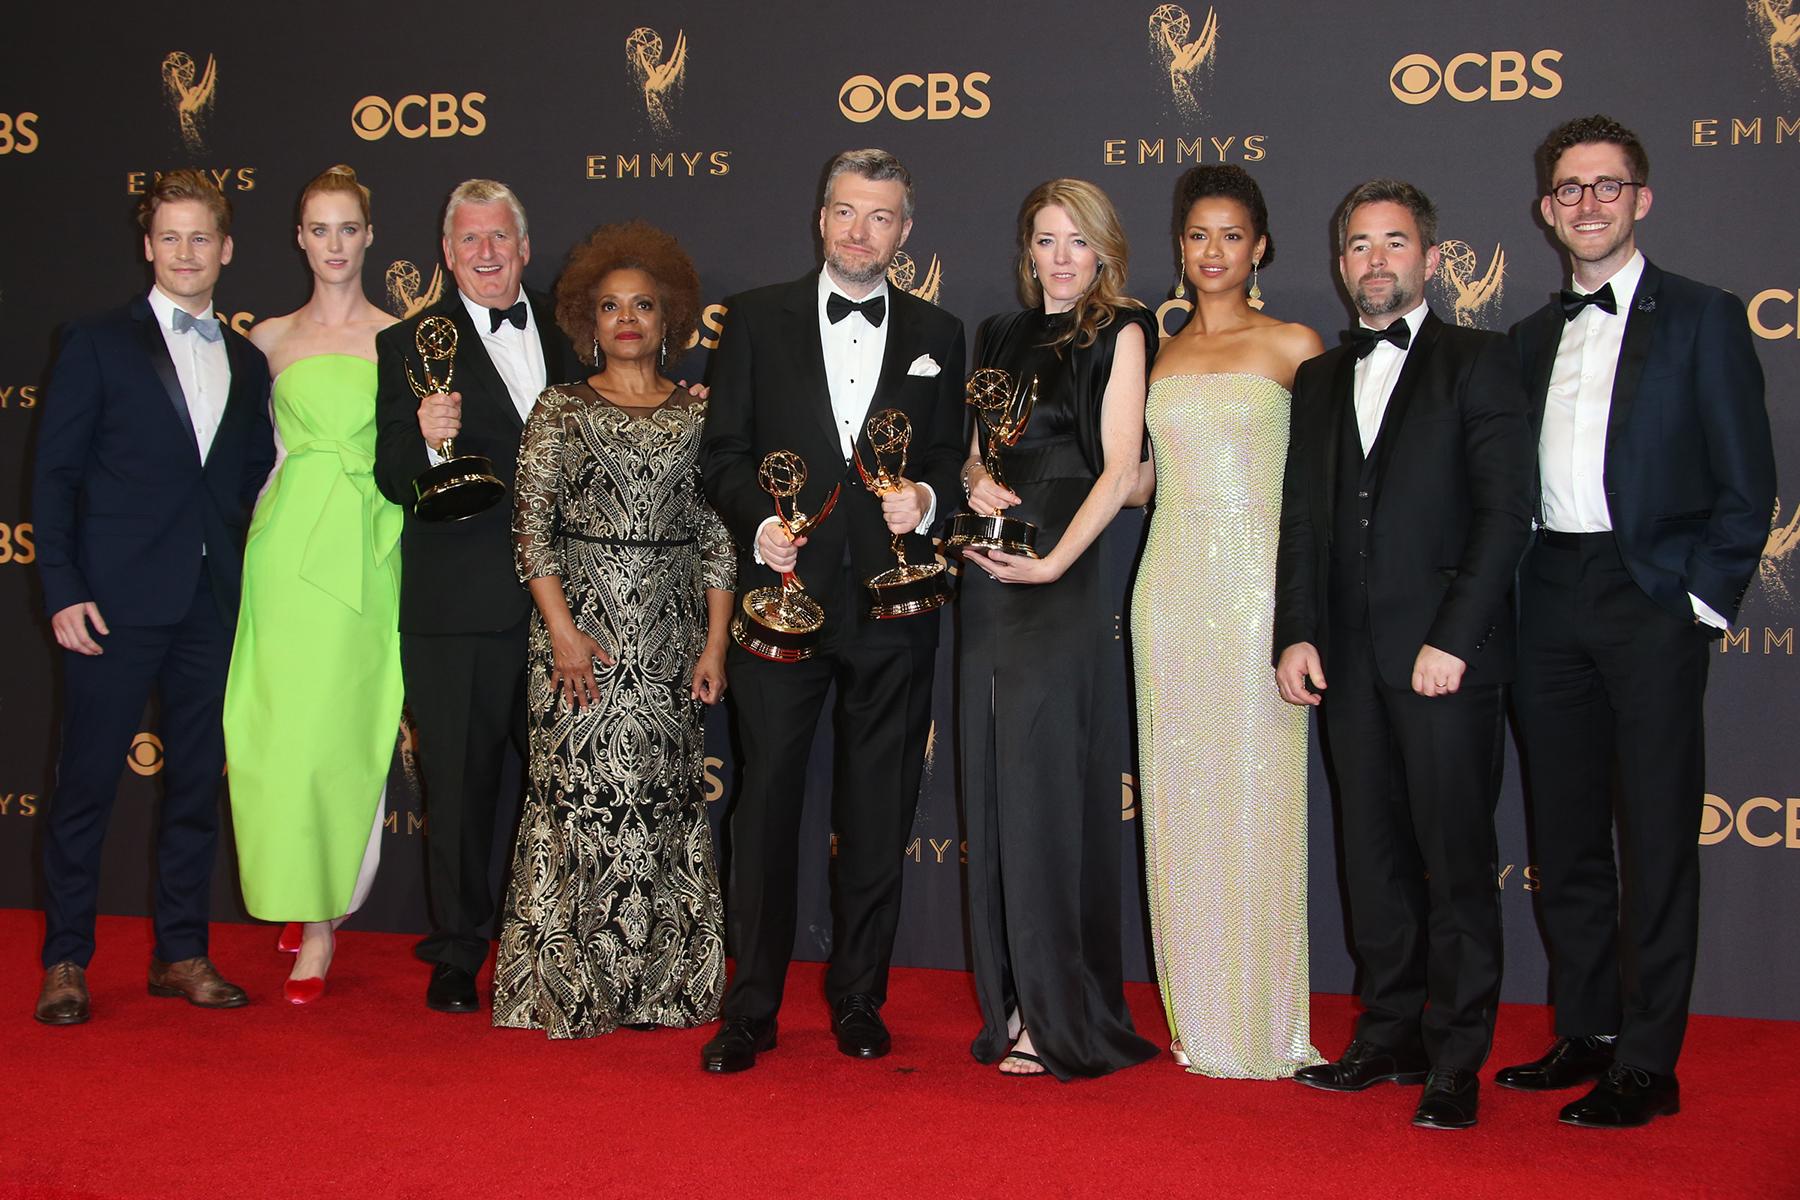 Emmys2017BlackmirrorSanJunipero